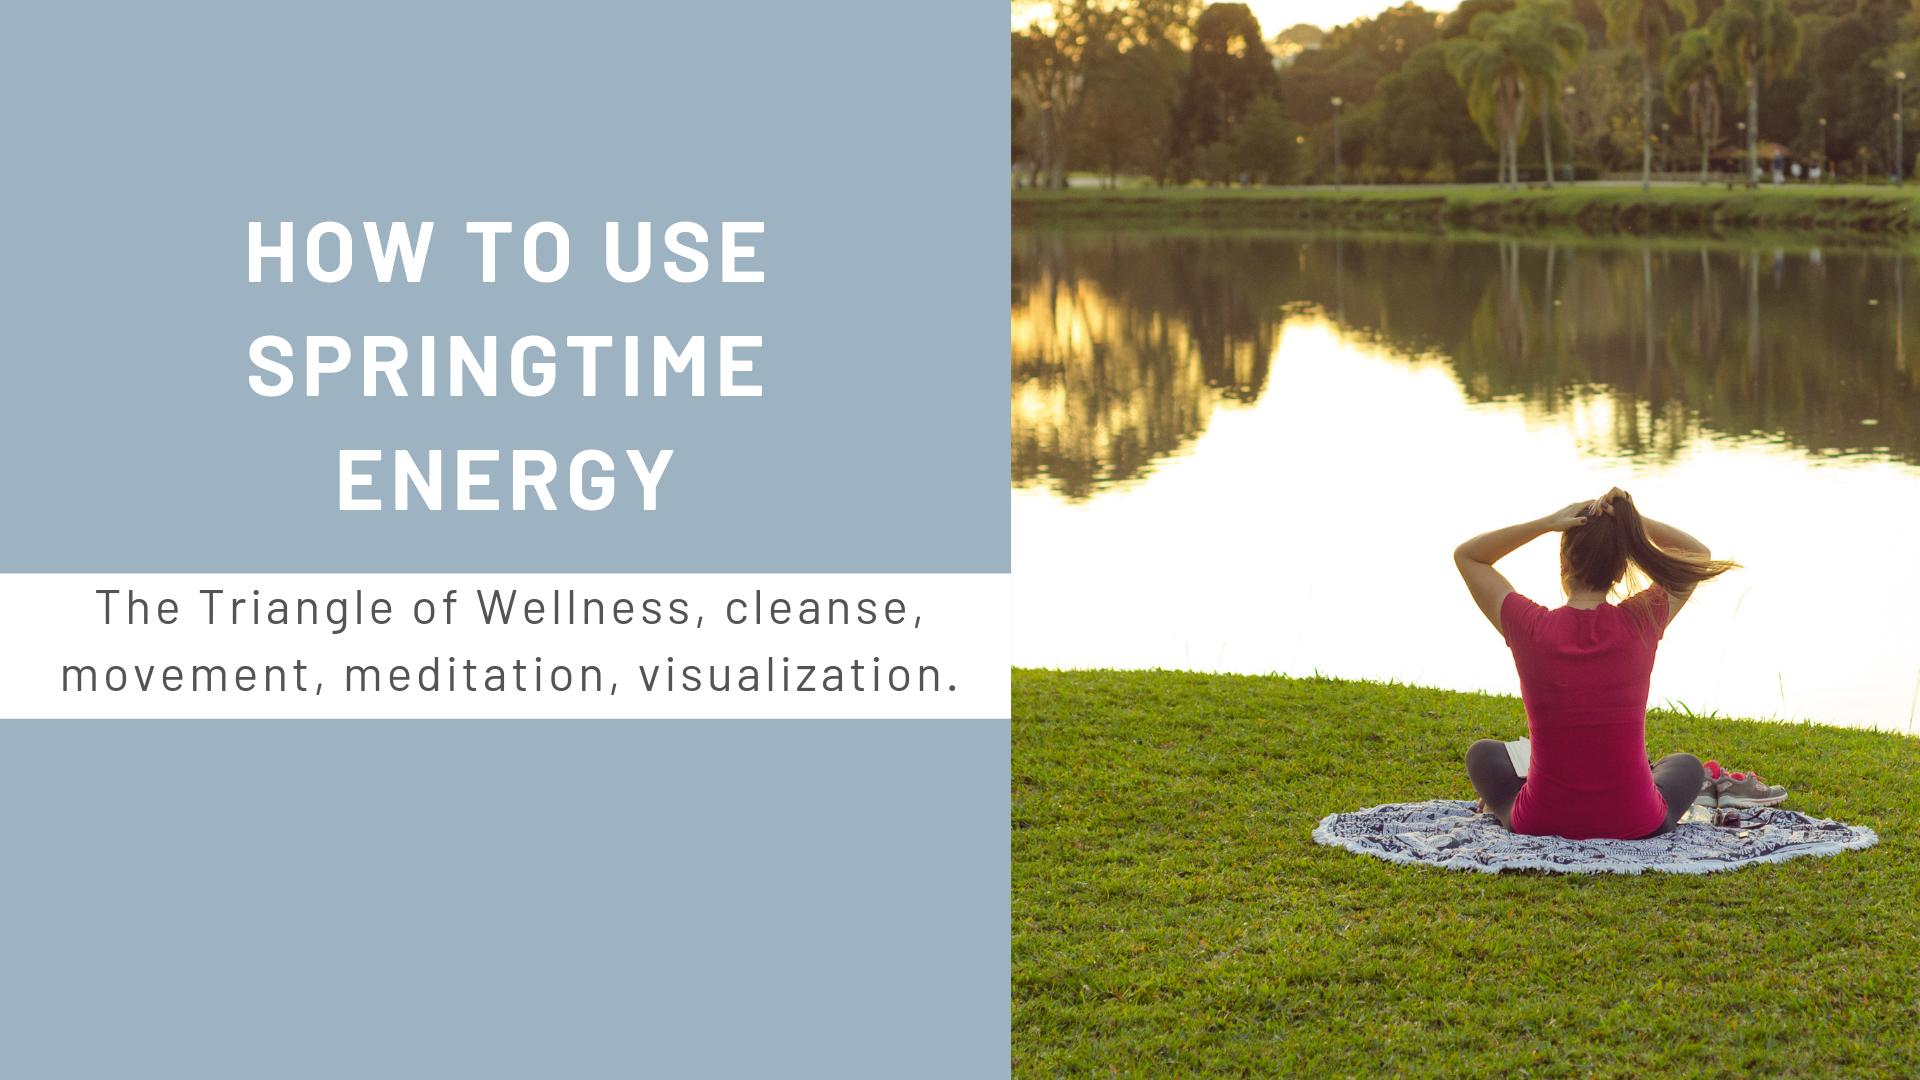 How to Use Springtime Energy